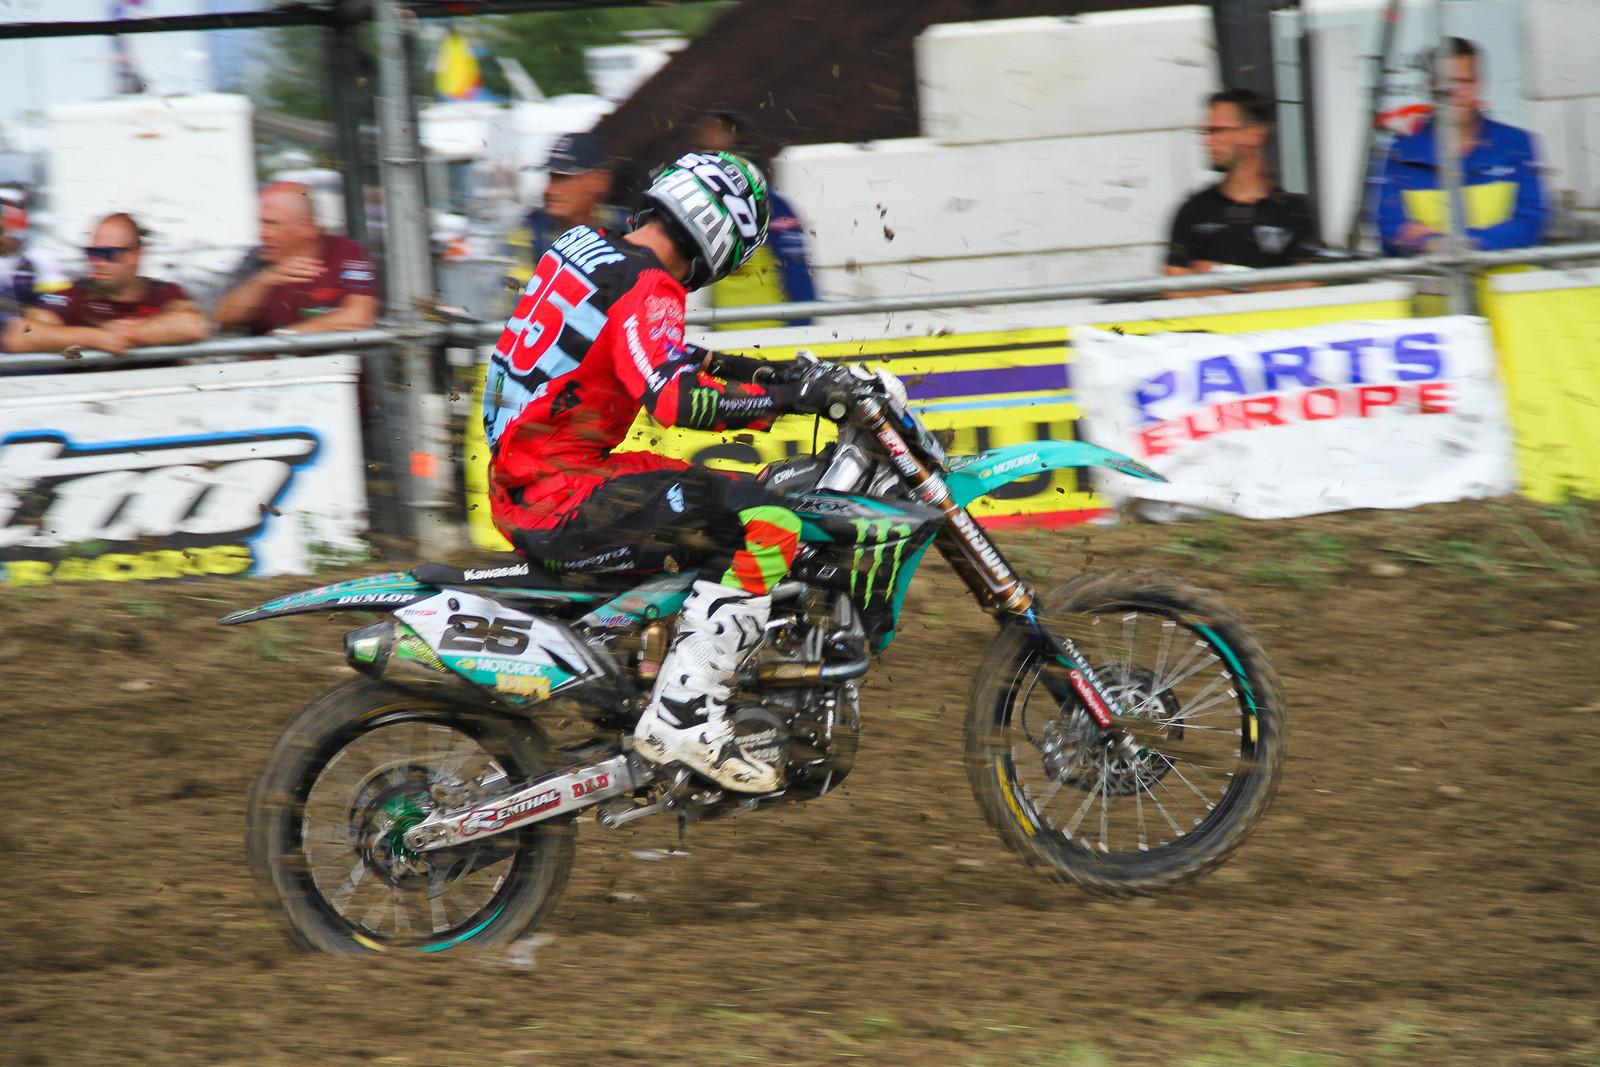 Clement Desalle - ayearinmx - Motocross Pictures - Vital MX